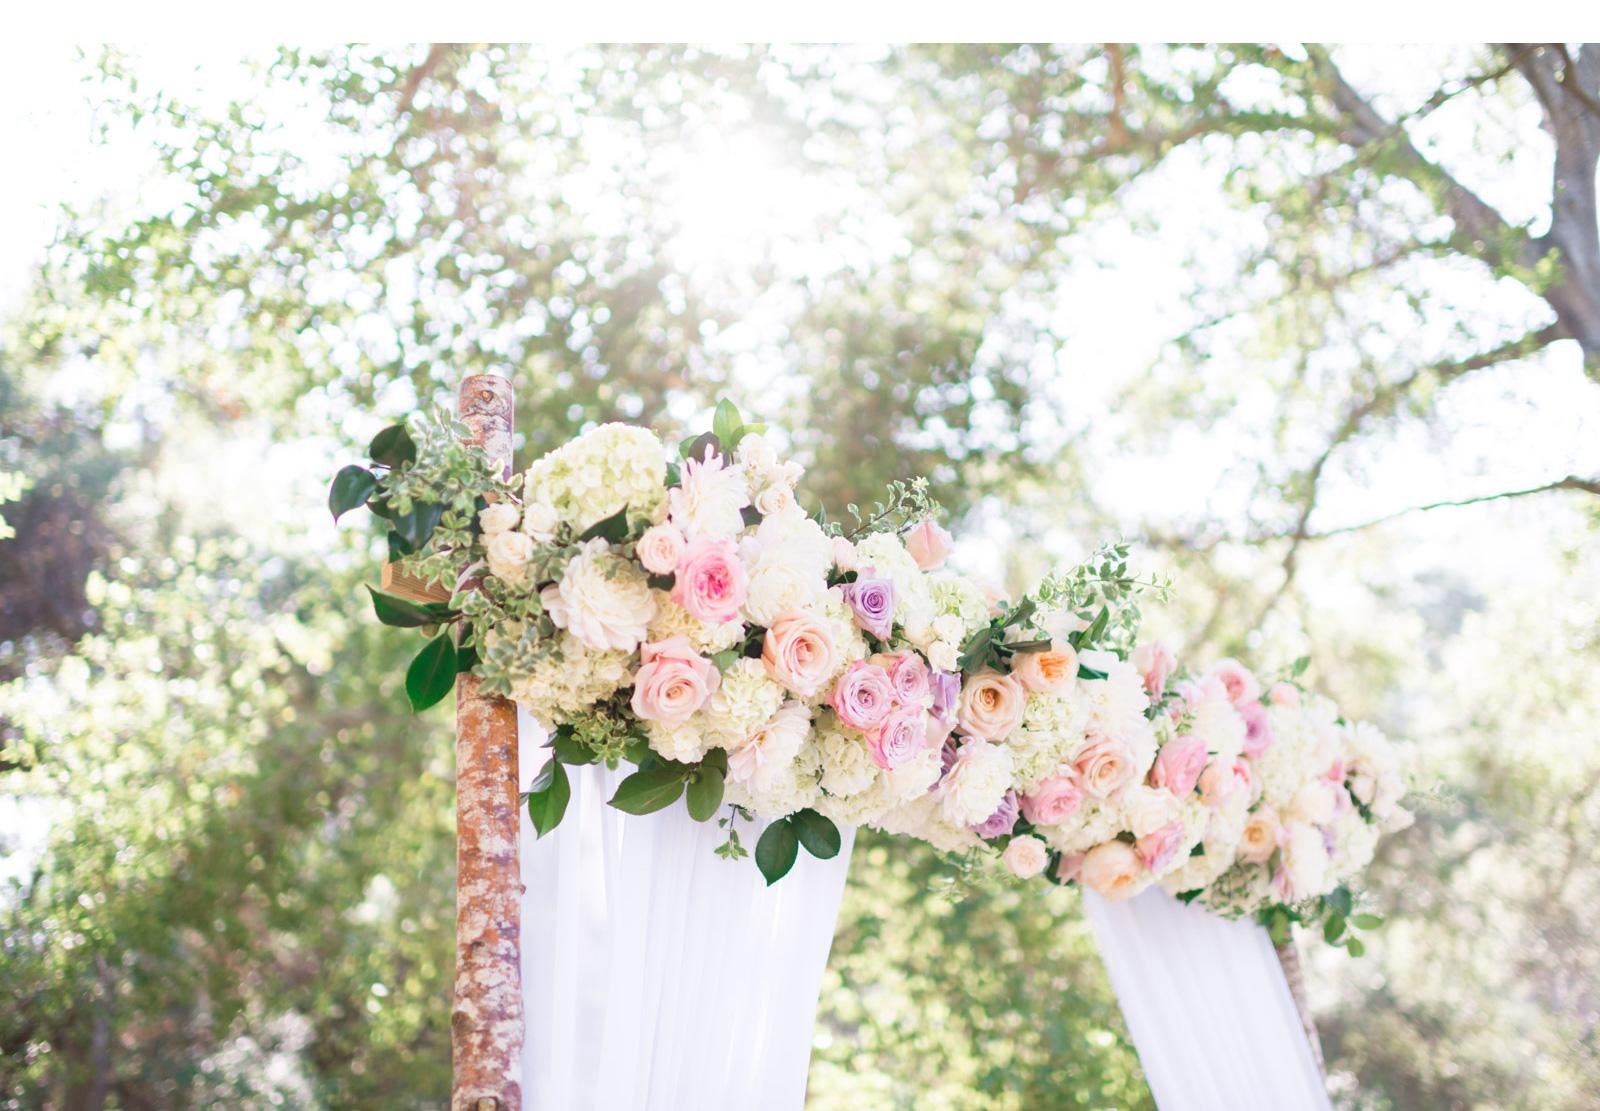 Temecula-Winery-Wedding-Natalie-Schutt-Photography_01.jpg